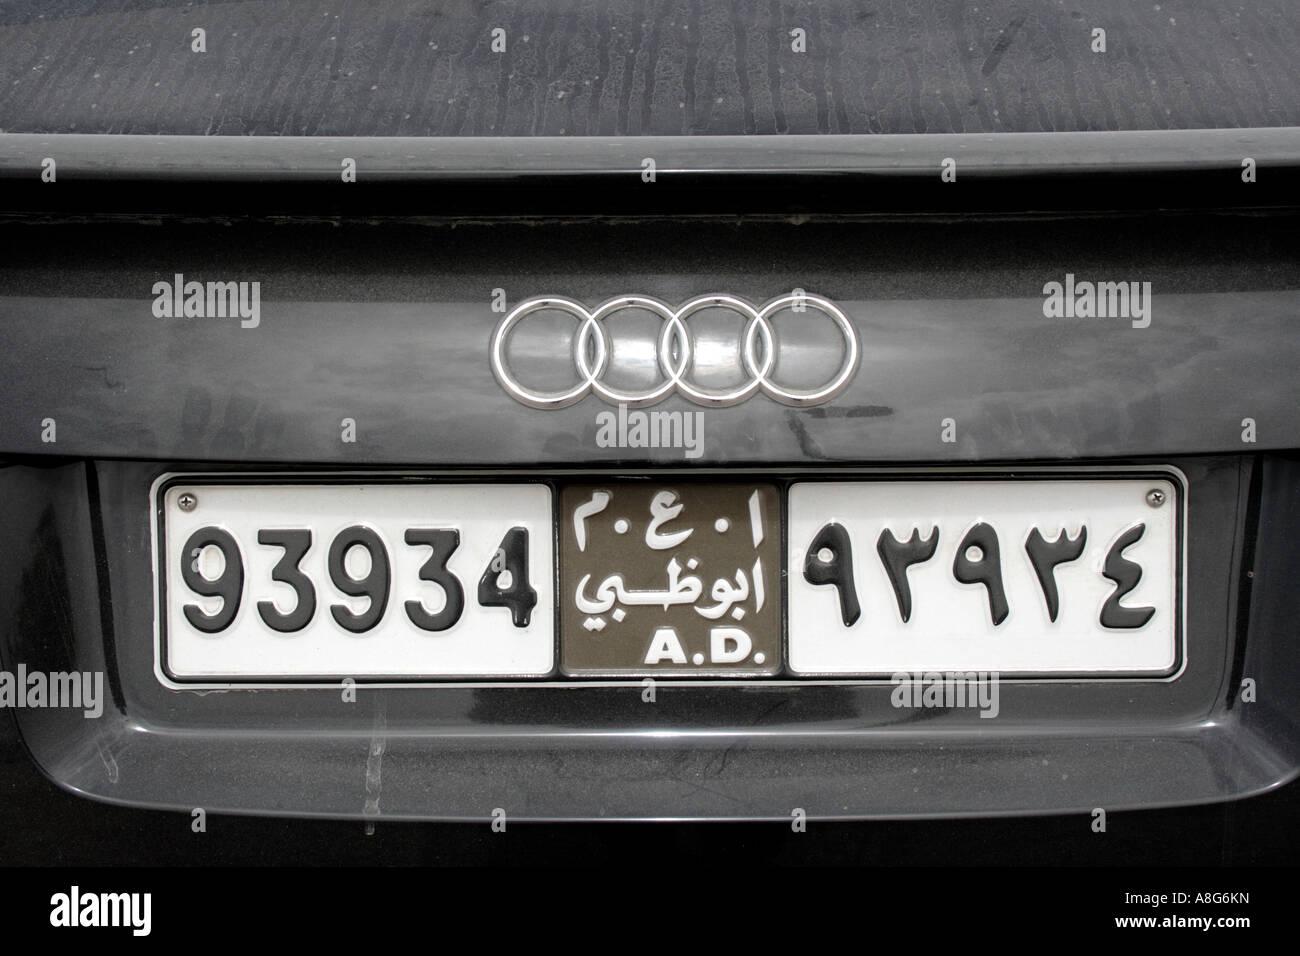 Audi Symbol Stockfotos & Audi Symbol Bilder - Seite 2 - Alamy